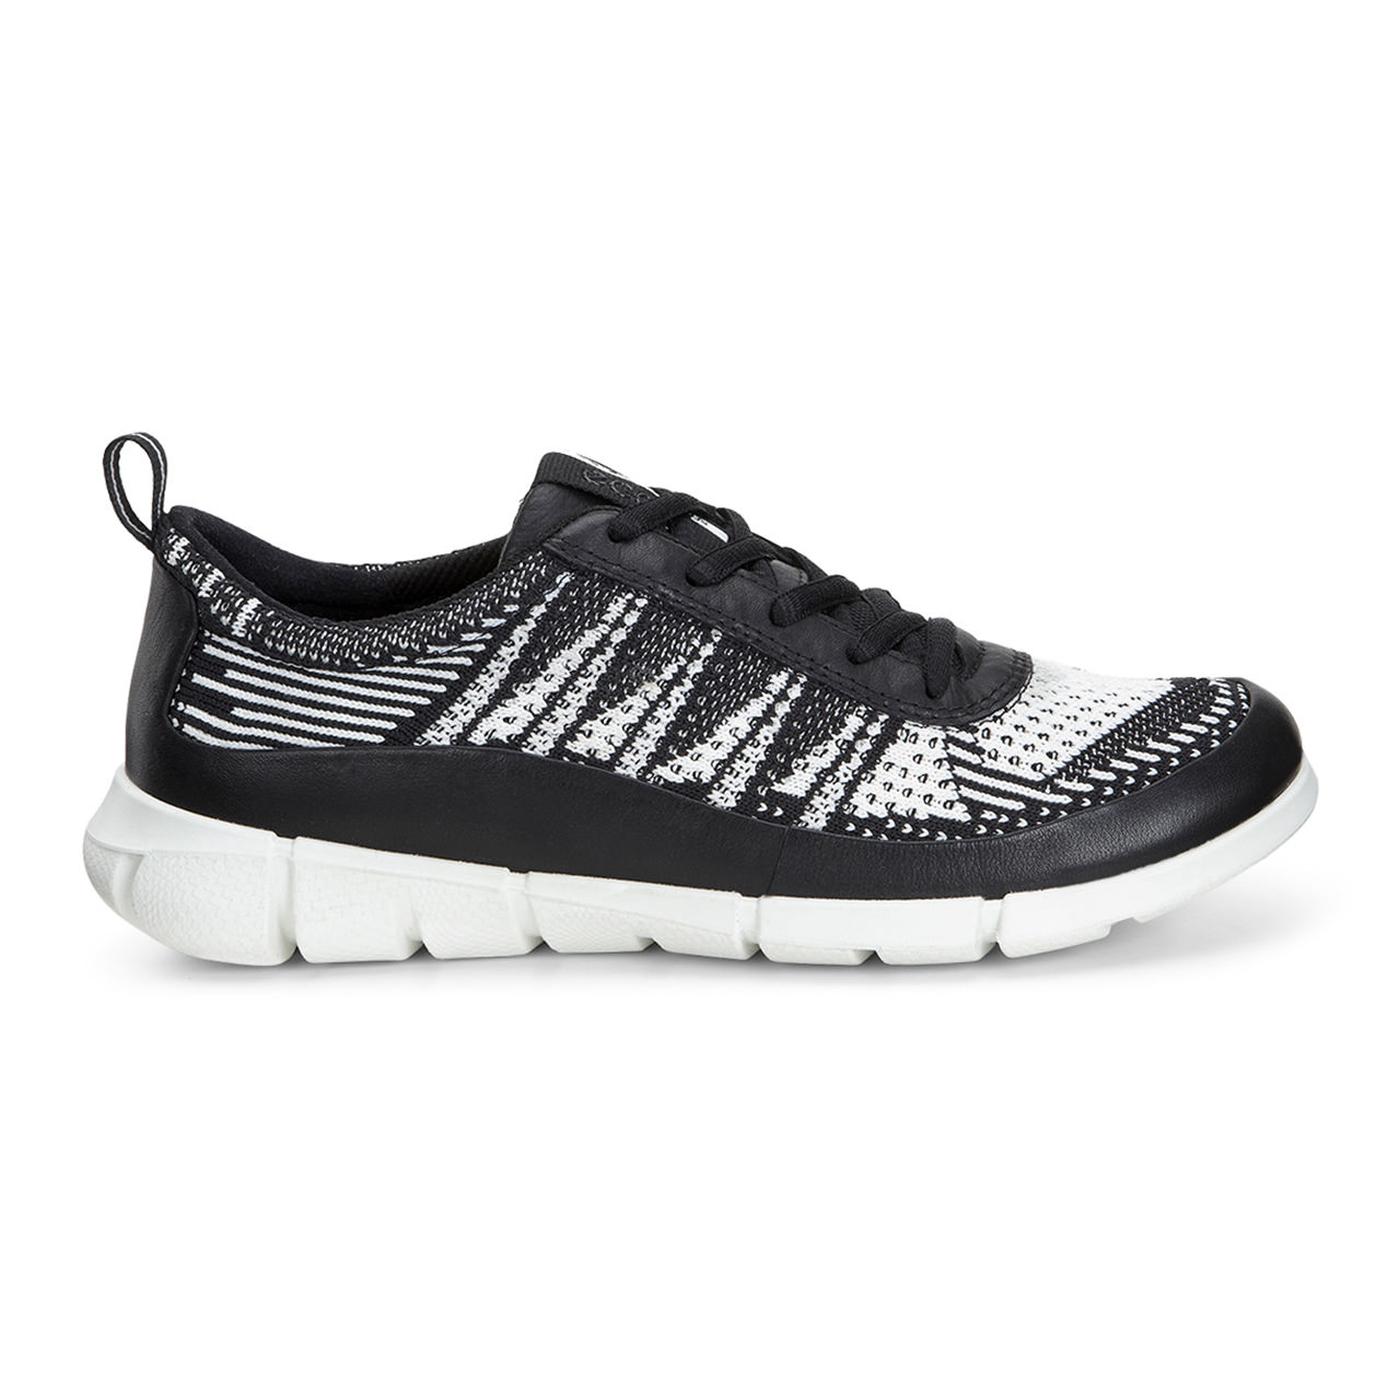 ECCO INTRINSIC1 Ladies Sneaker Knit